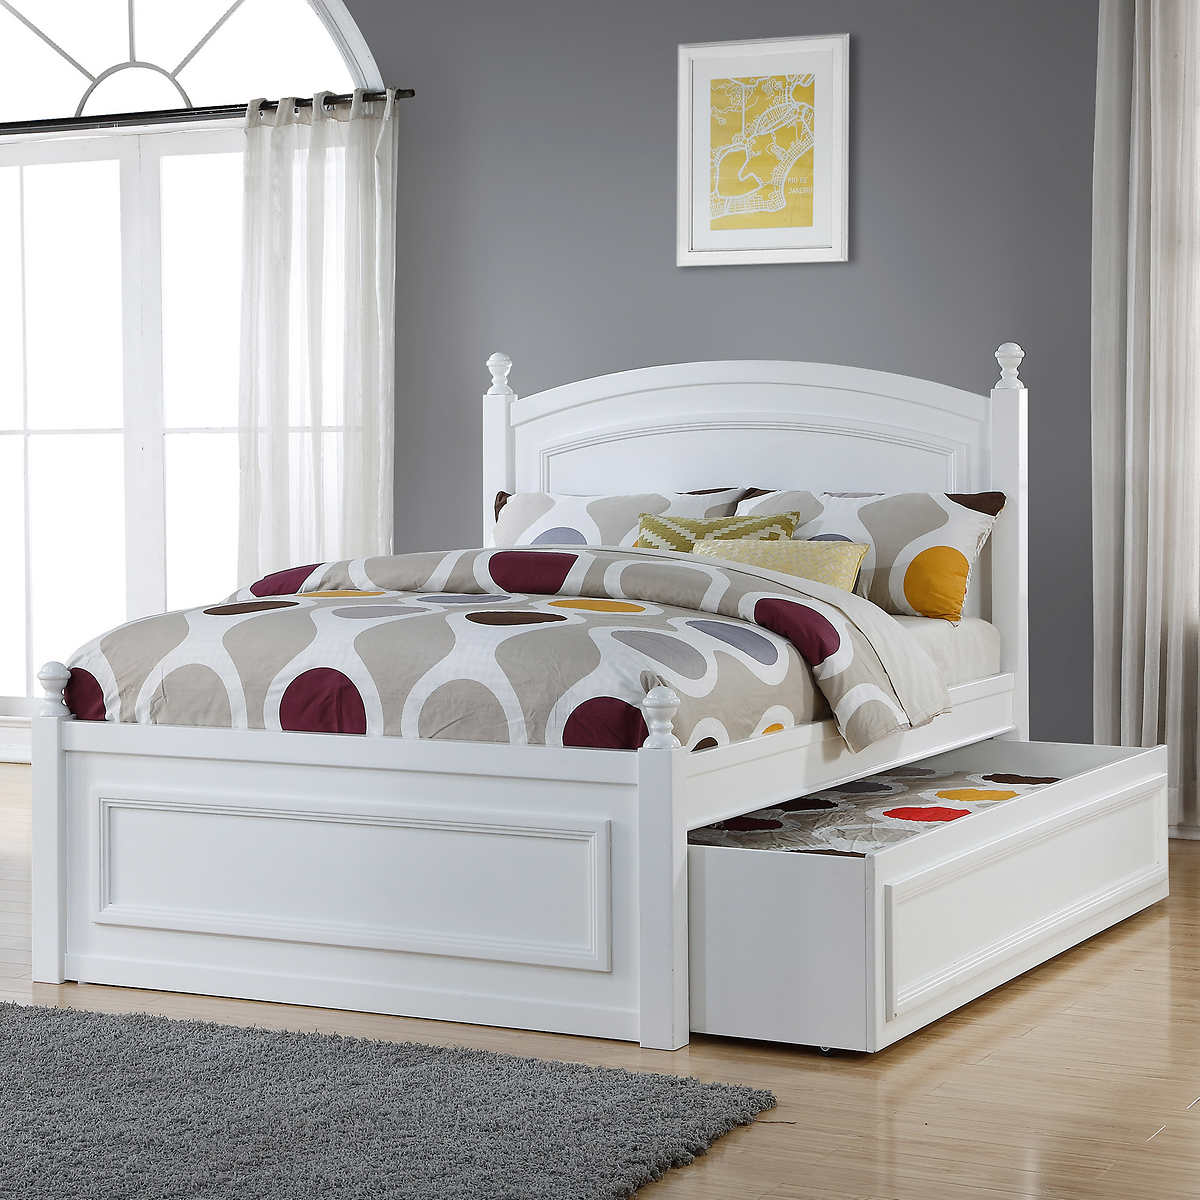 tempat tidur anak minimalis putih bahan full kayu